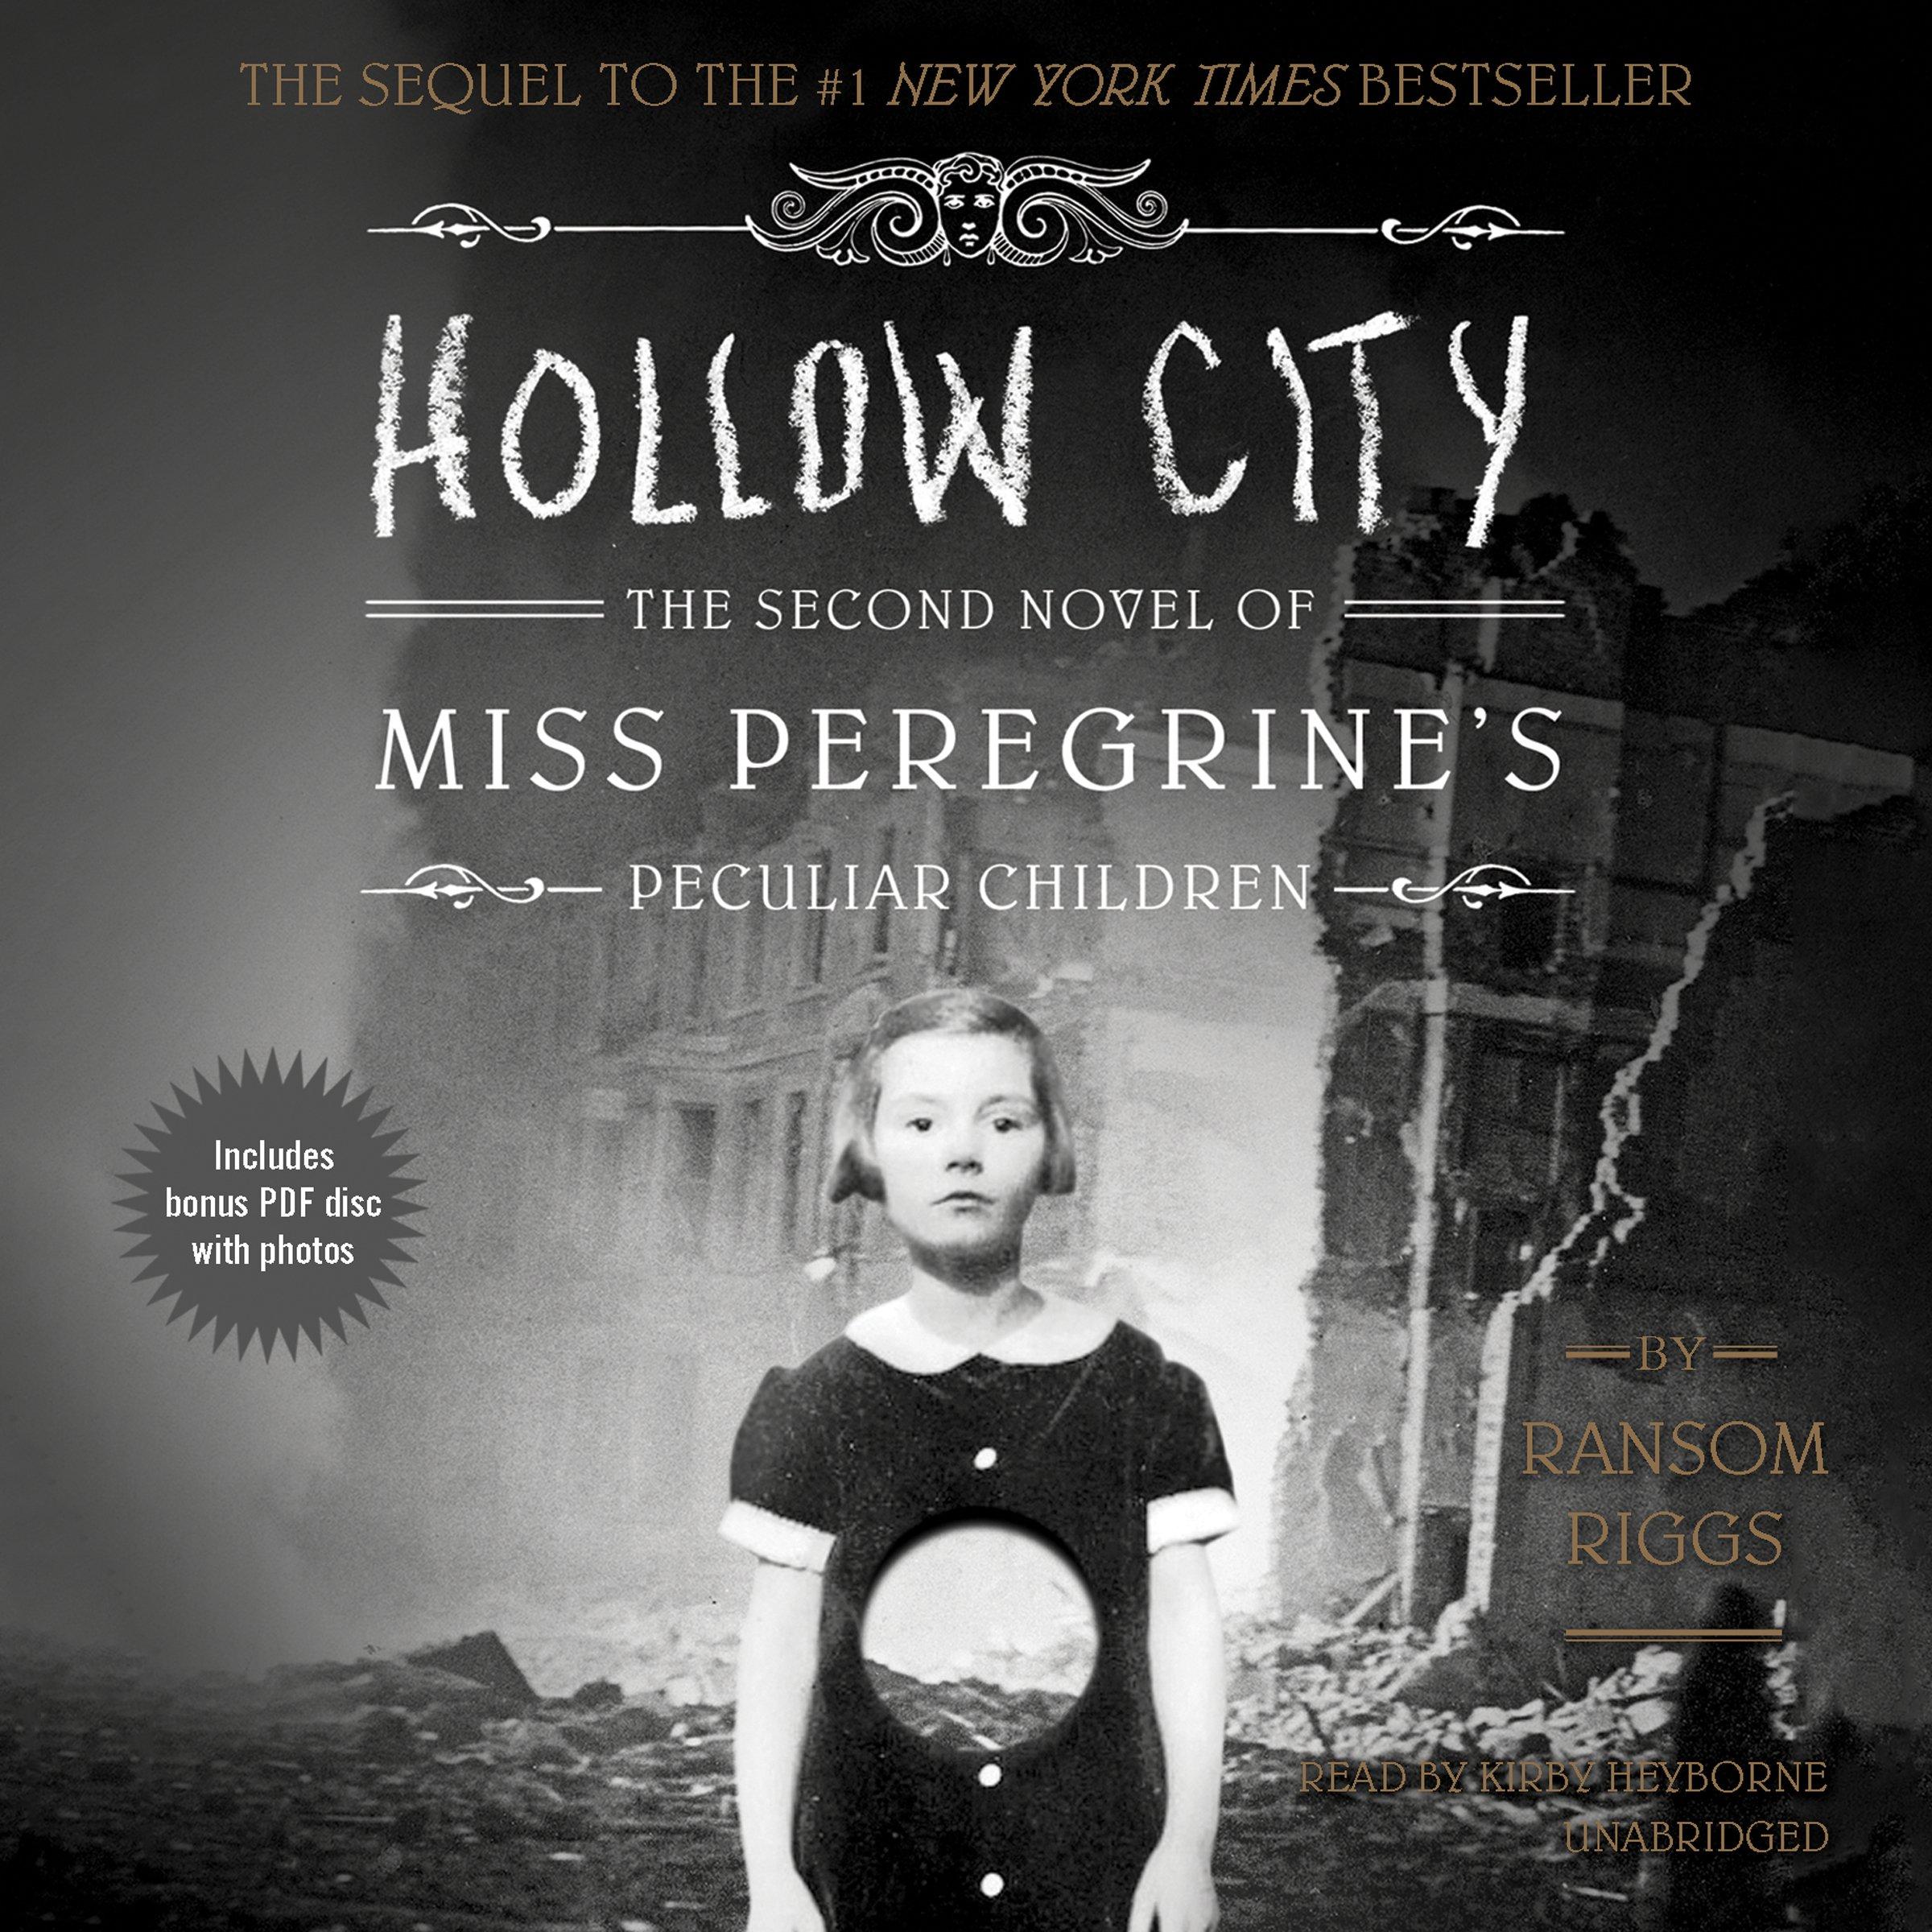 miss peregrine full movie free download